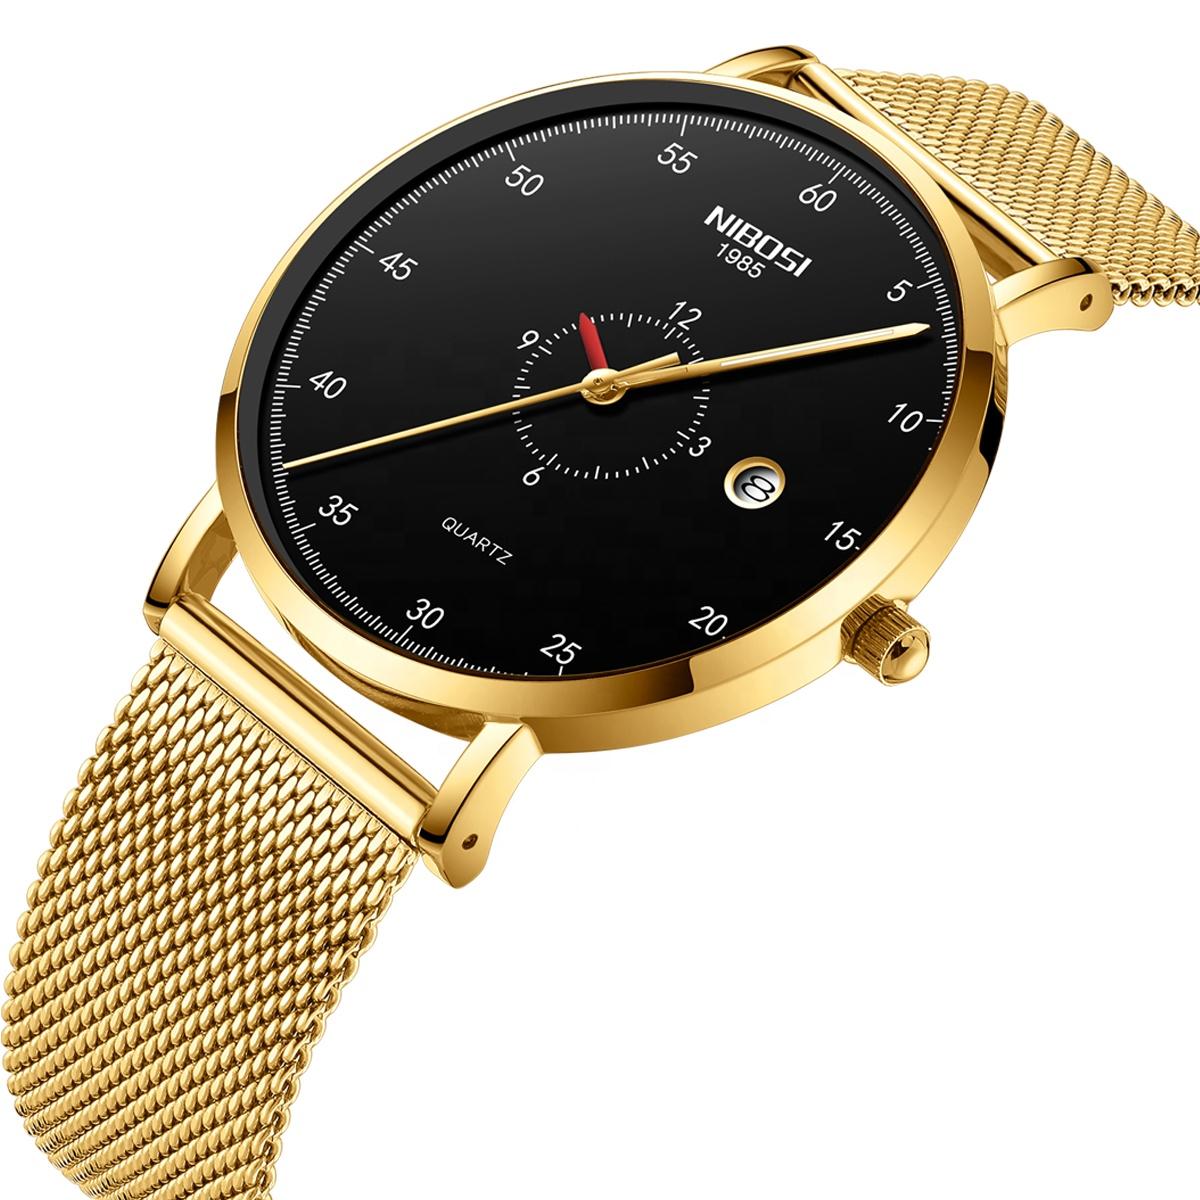 NIBOSI 2360 Mens Watches Top Brand Luxury Fashion Watch Slim Mesh Date Waterproof Quartz Watch